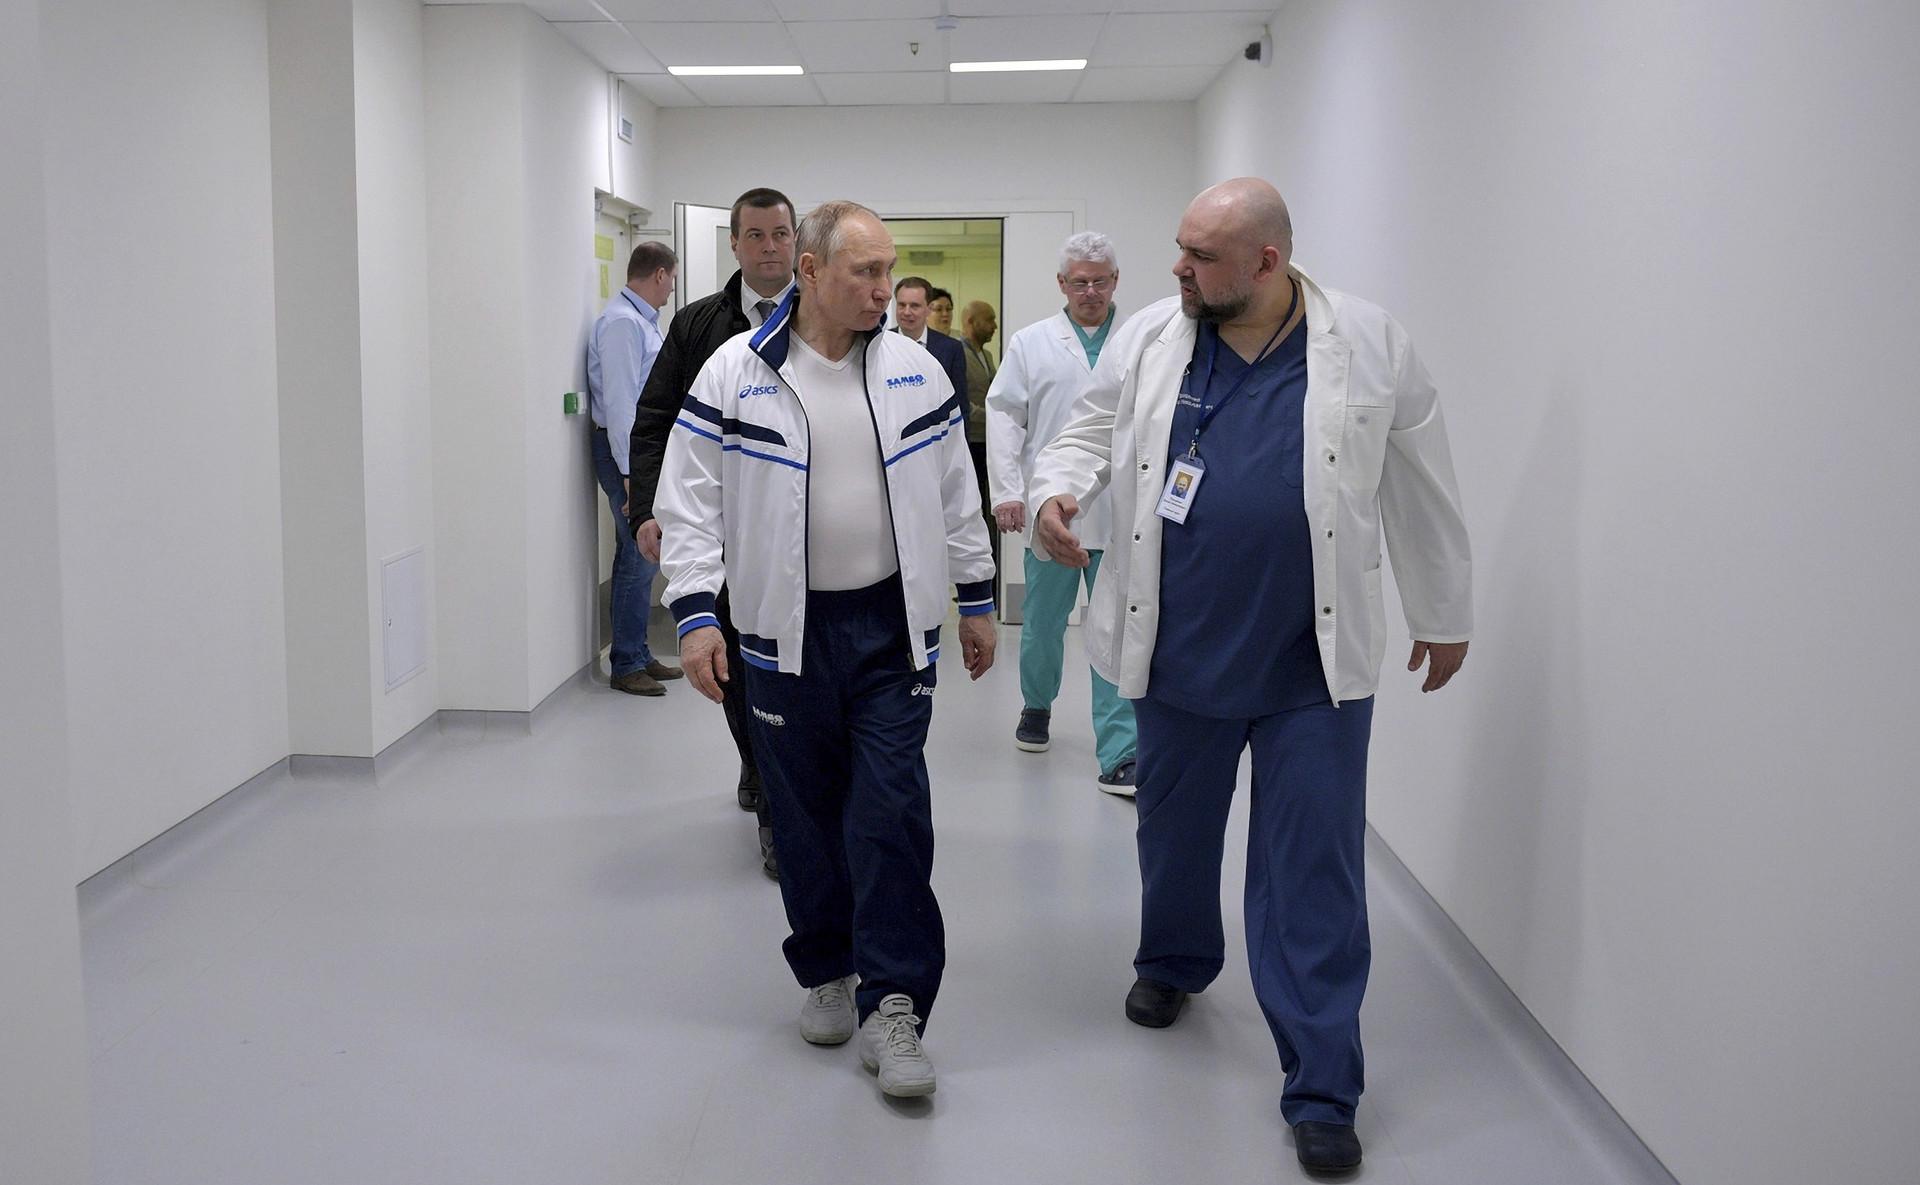 Kepala Dokter Rumah Sakit Kota No.40 Denis Protsenko mendampingi Presiden Vladimir Putin sebelum mengenakan pakaian dekontamisasi untuk meninjau rumah sakit yang merawat pasien virus corona, Senin (24/3).